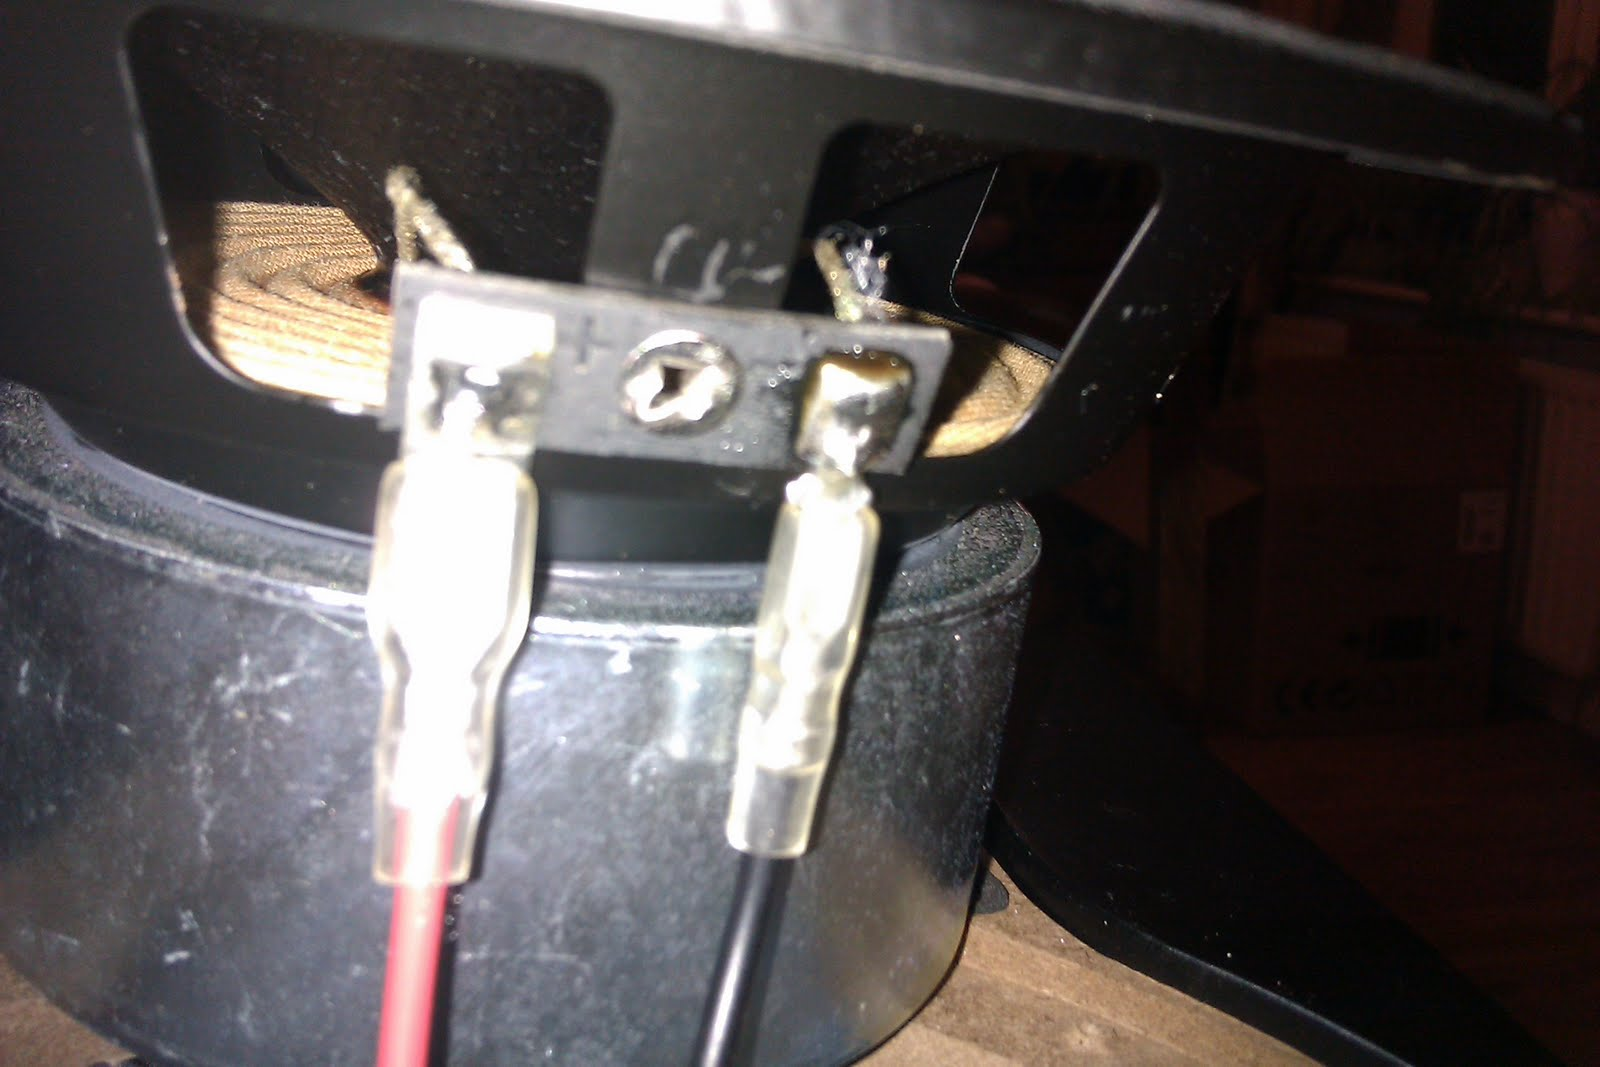 Mending Things A Pair Of M Audio Bx5a Monitors Circuit Diagram